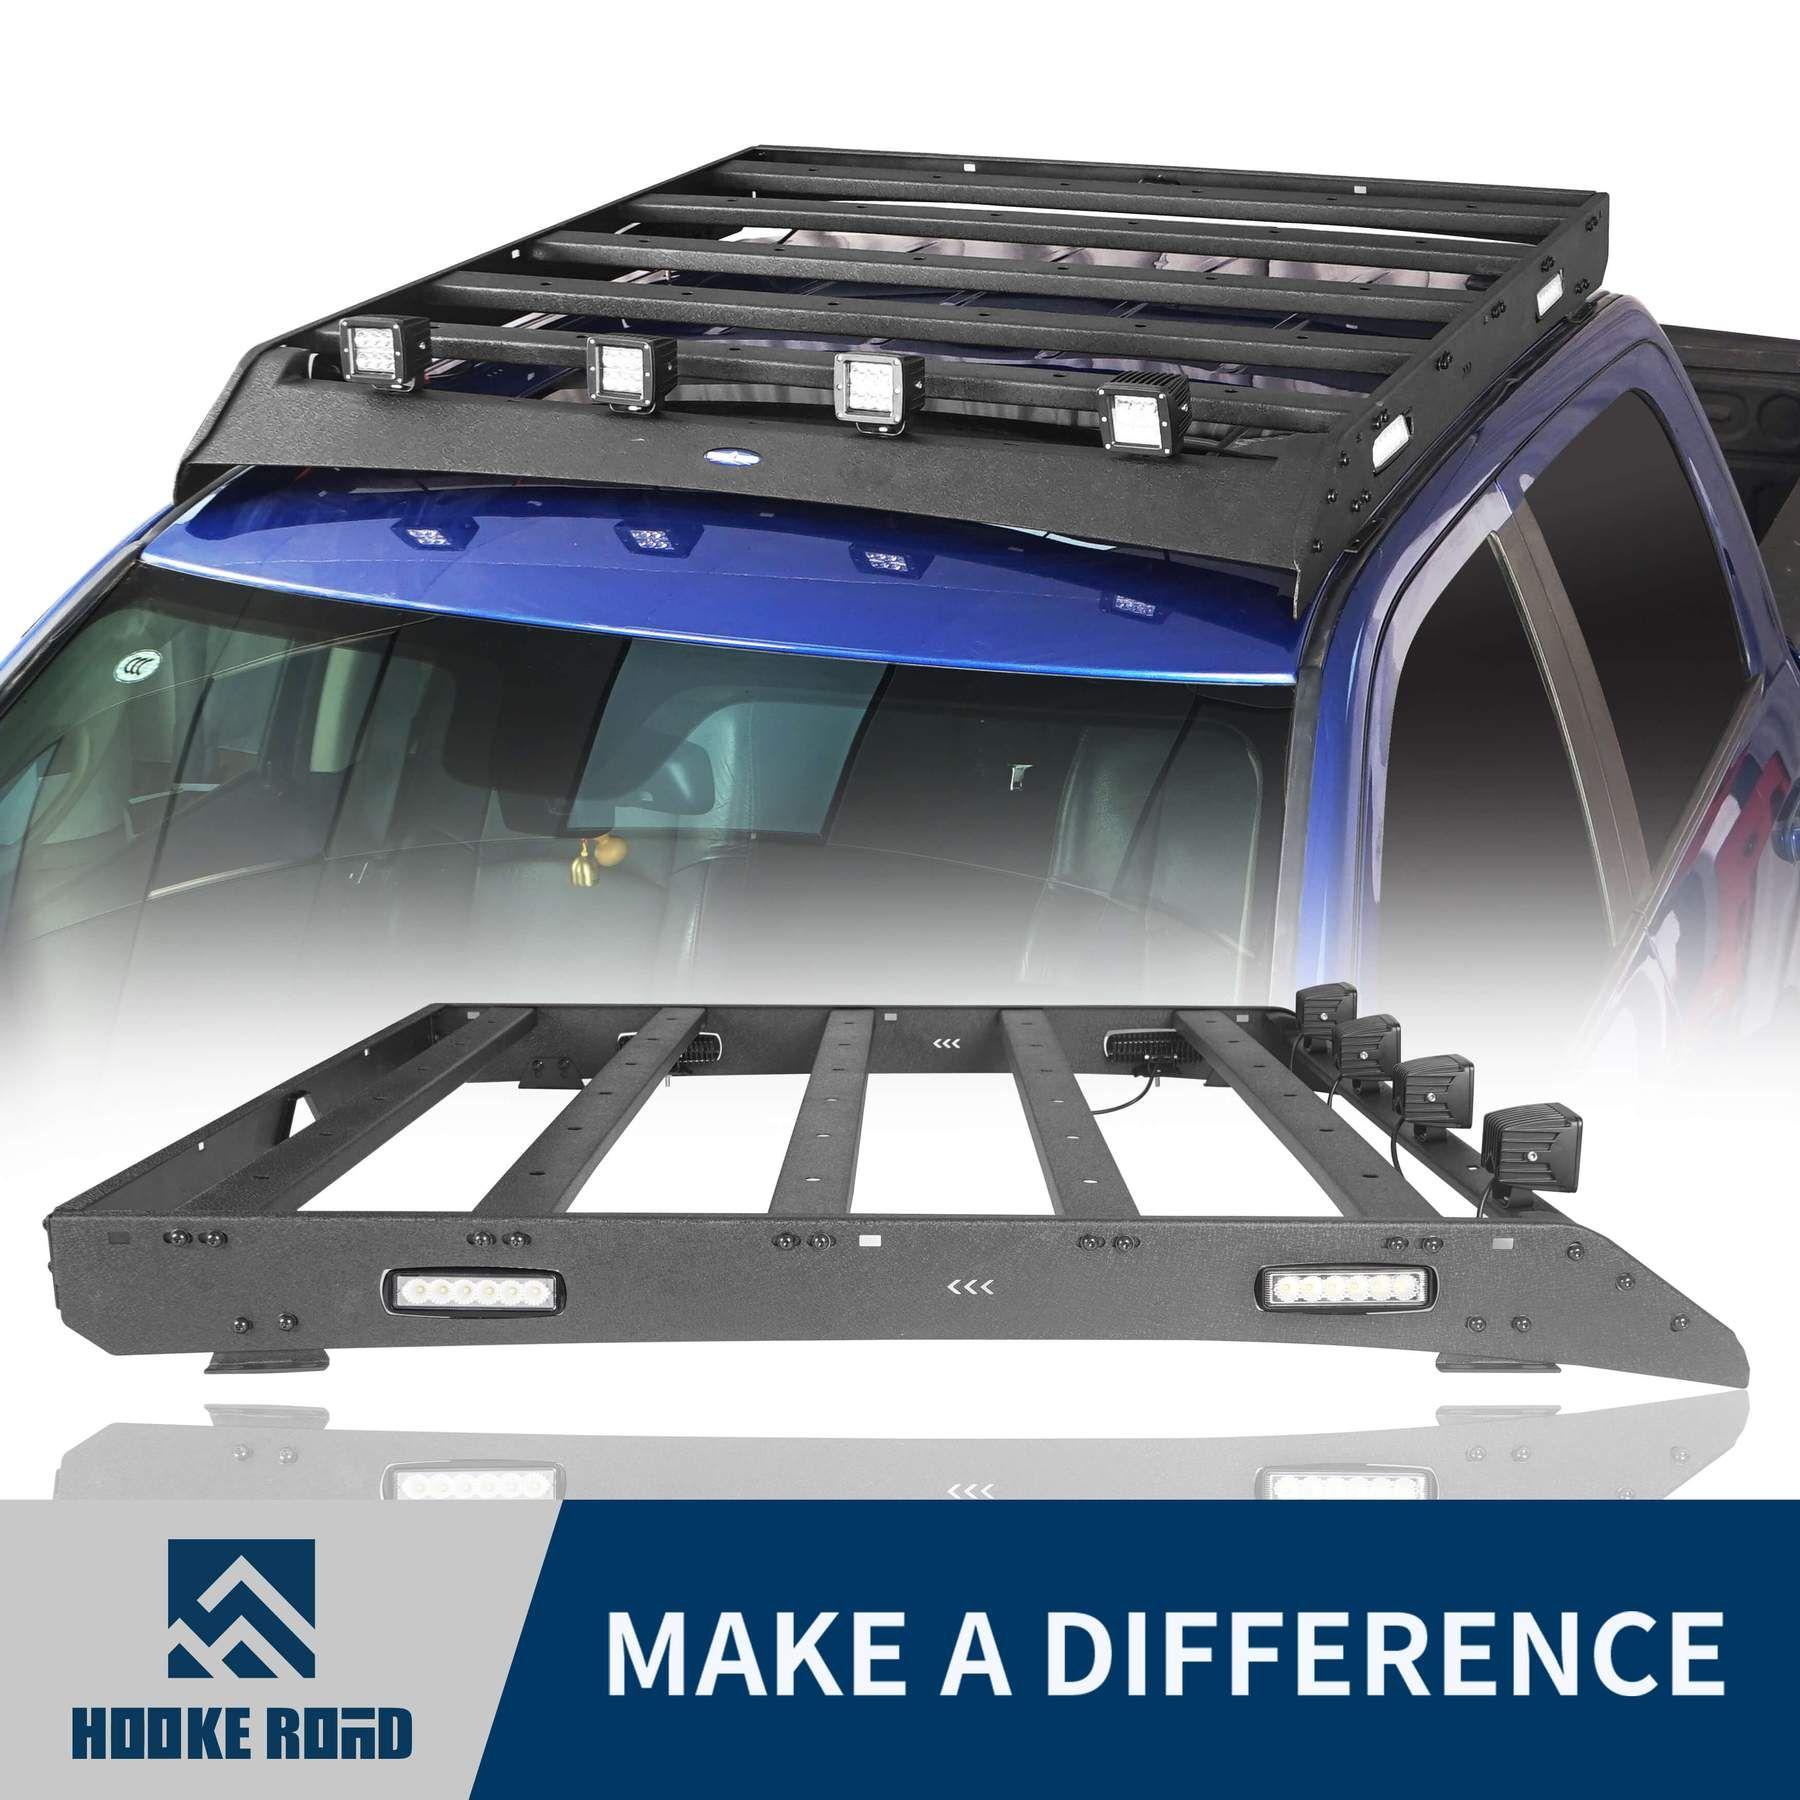 Hooke Road Top Roof Rack Cargo Carrier 09 18 Dodge Ram 1500 Crew Cab In 2020 Roof Rack Truck Roof Rack Dodge Ram